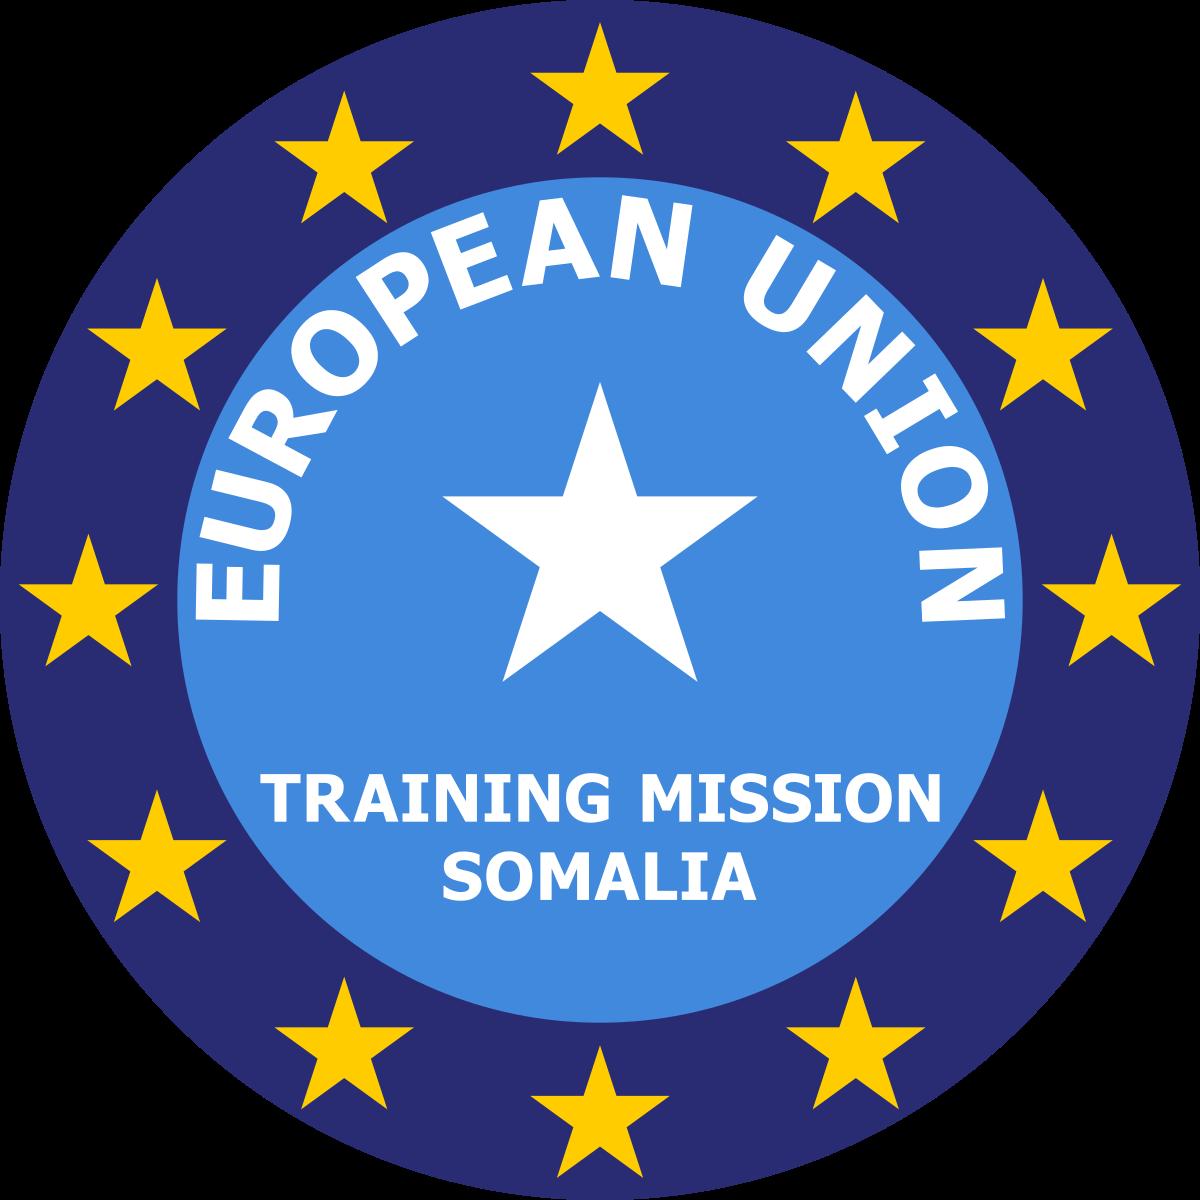 EU Training Mission in Somalia (EUTM-Somalia)